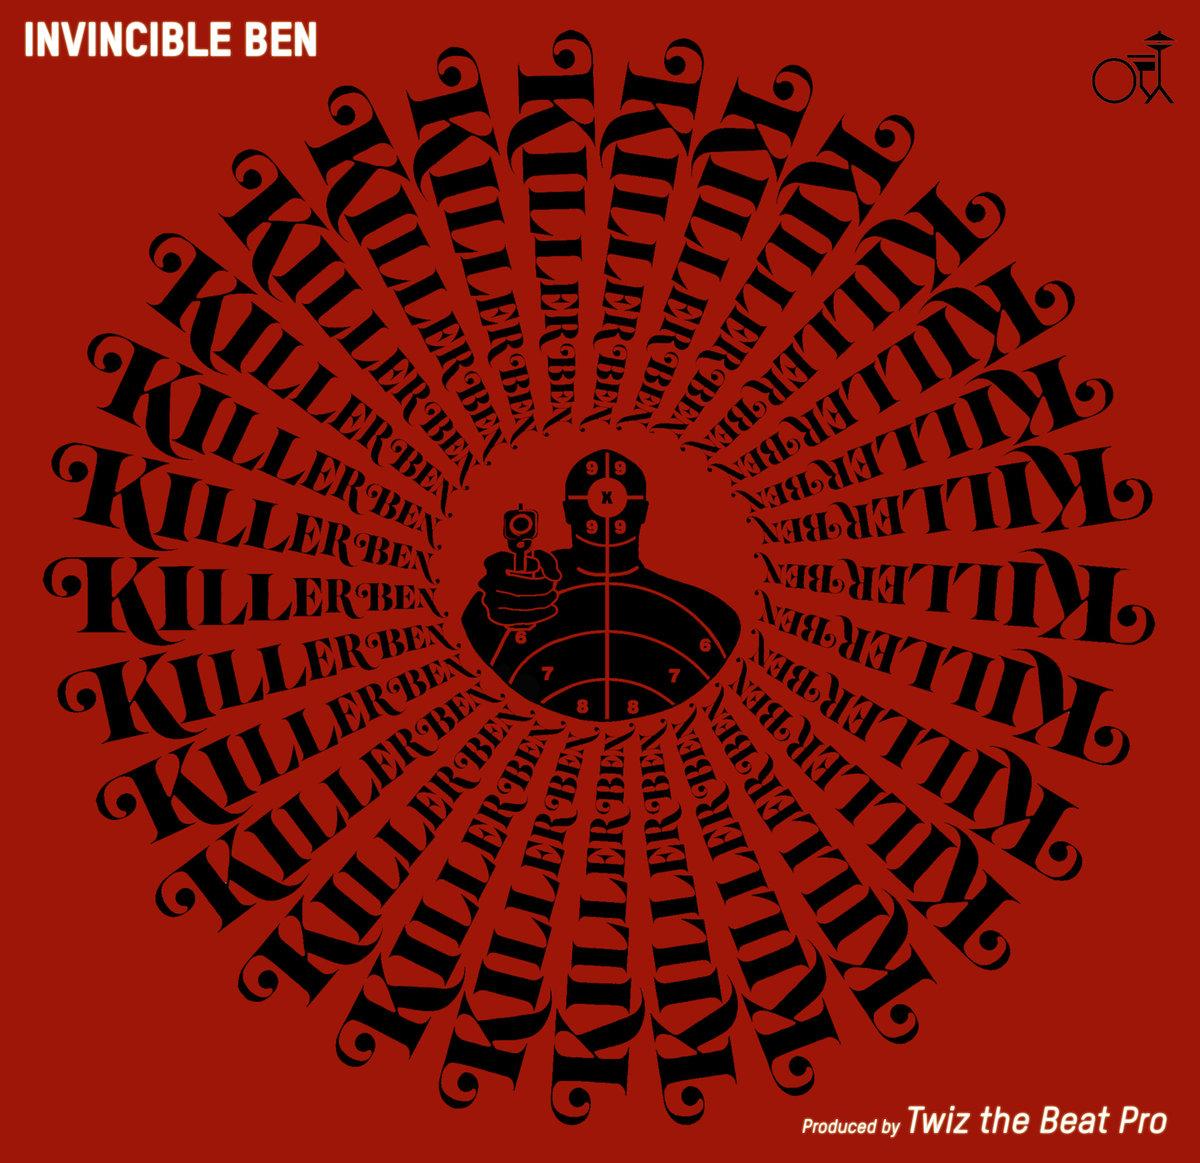 Invincible_ben